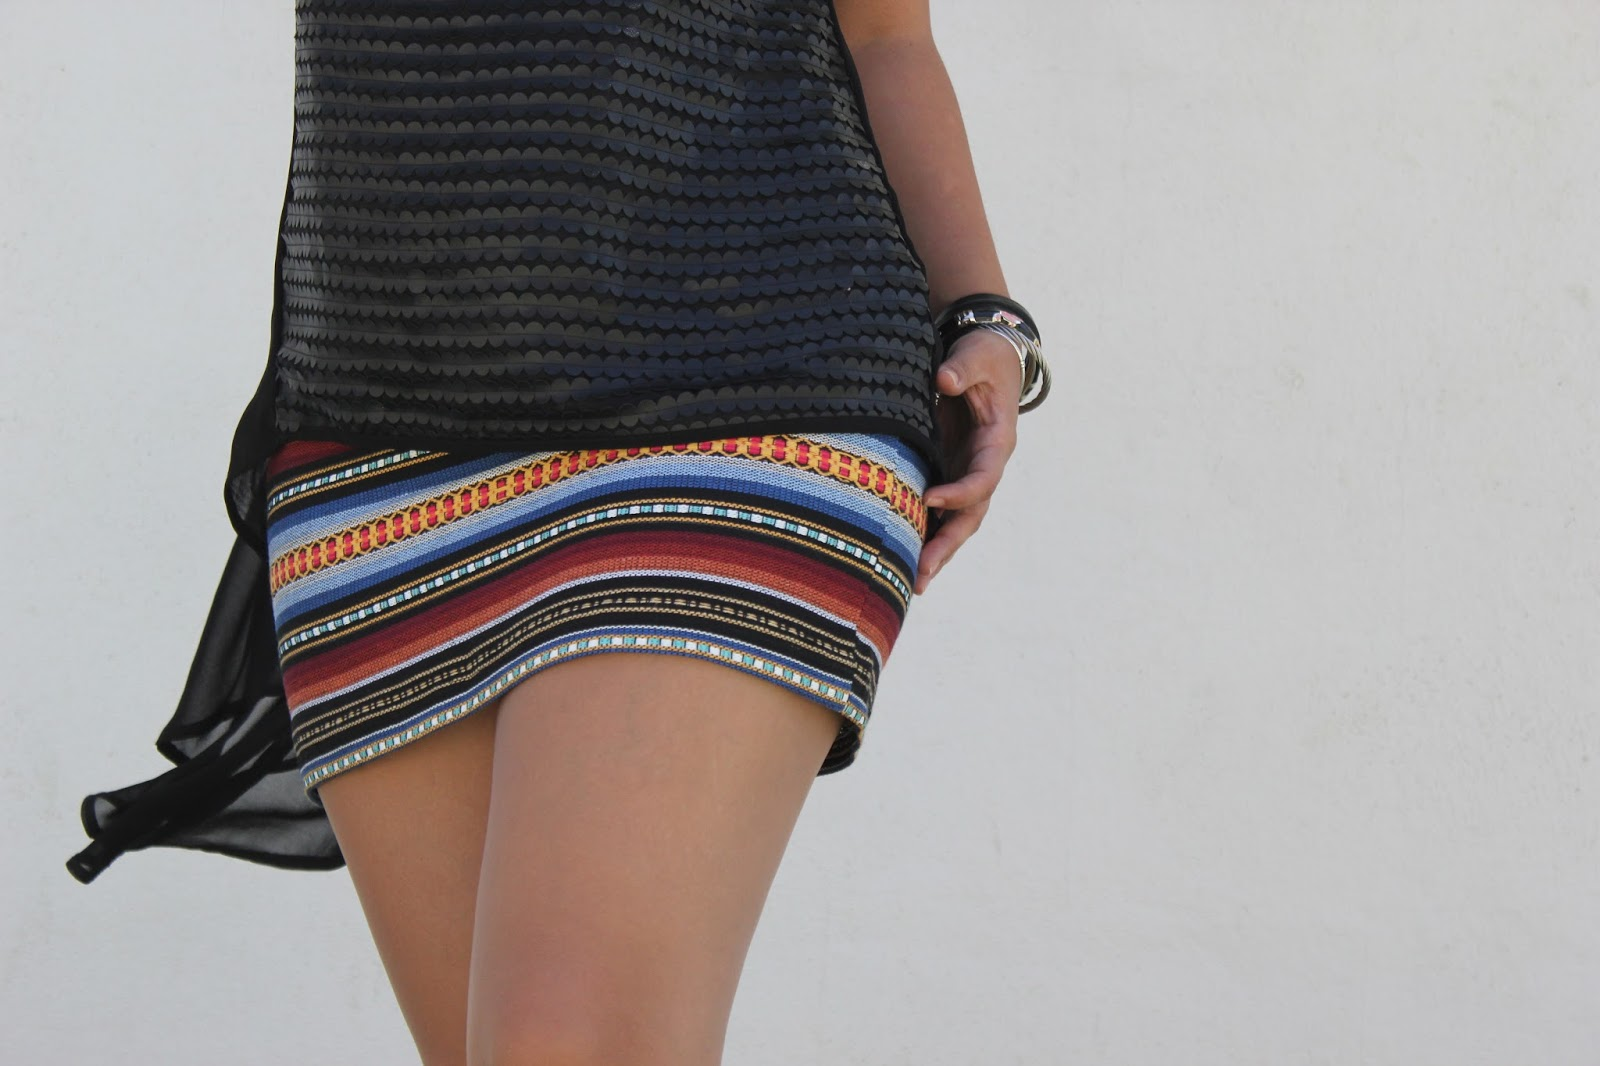 bb0b82d11 Costura fácil: mini falda étnica DIY (patrón gratis) | | Oh, Mother ...